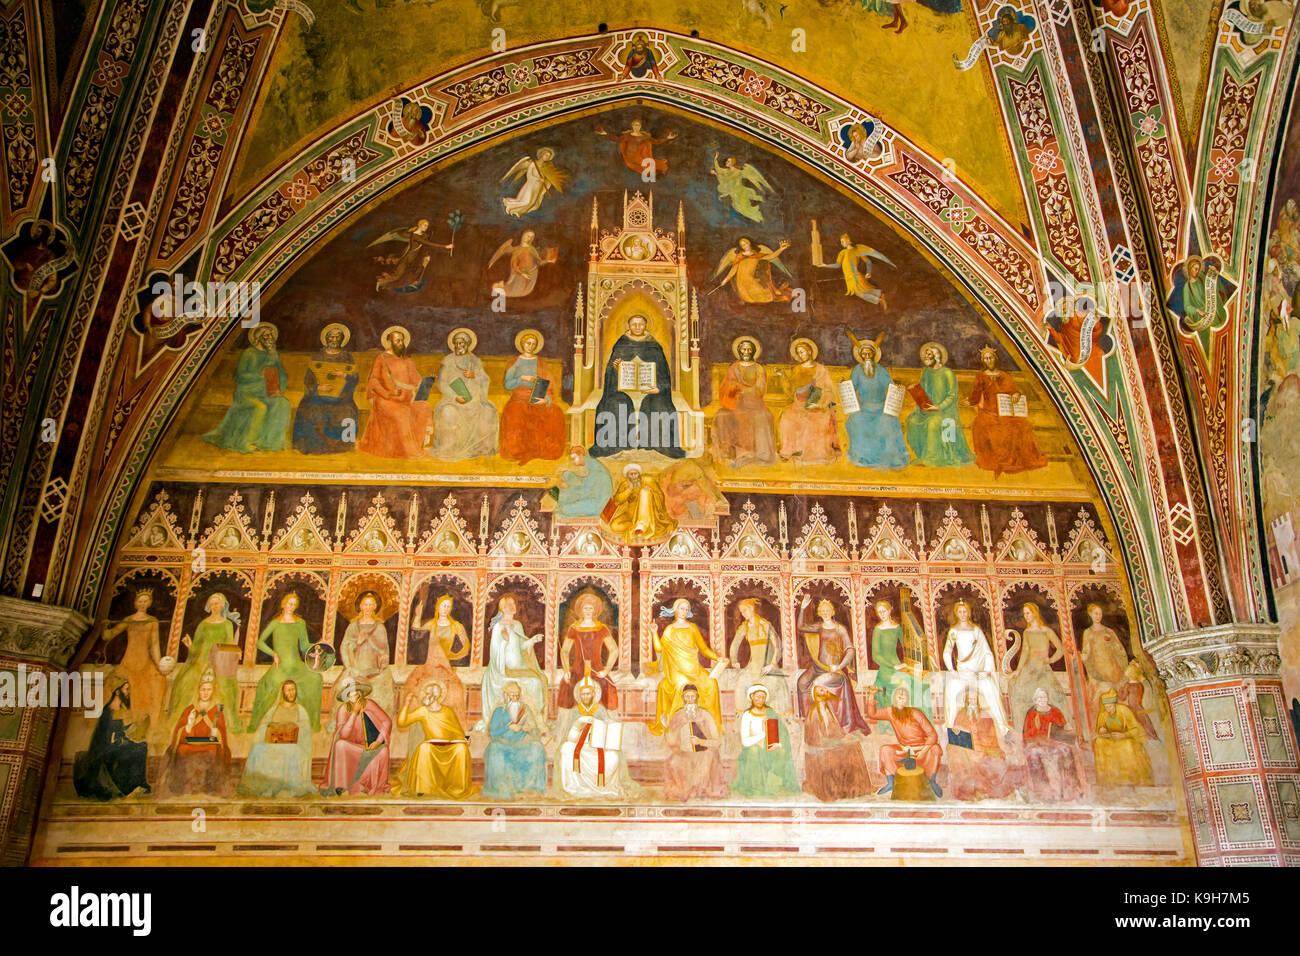 Triumph of the Catholic Doctrine by Andrea di Buonaiuto in the Spanish Chapel section of Santa Maria Novella church Stock Photo